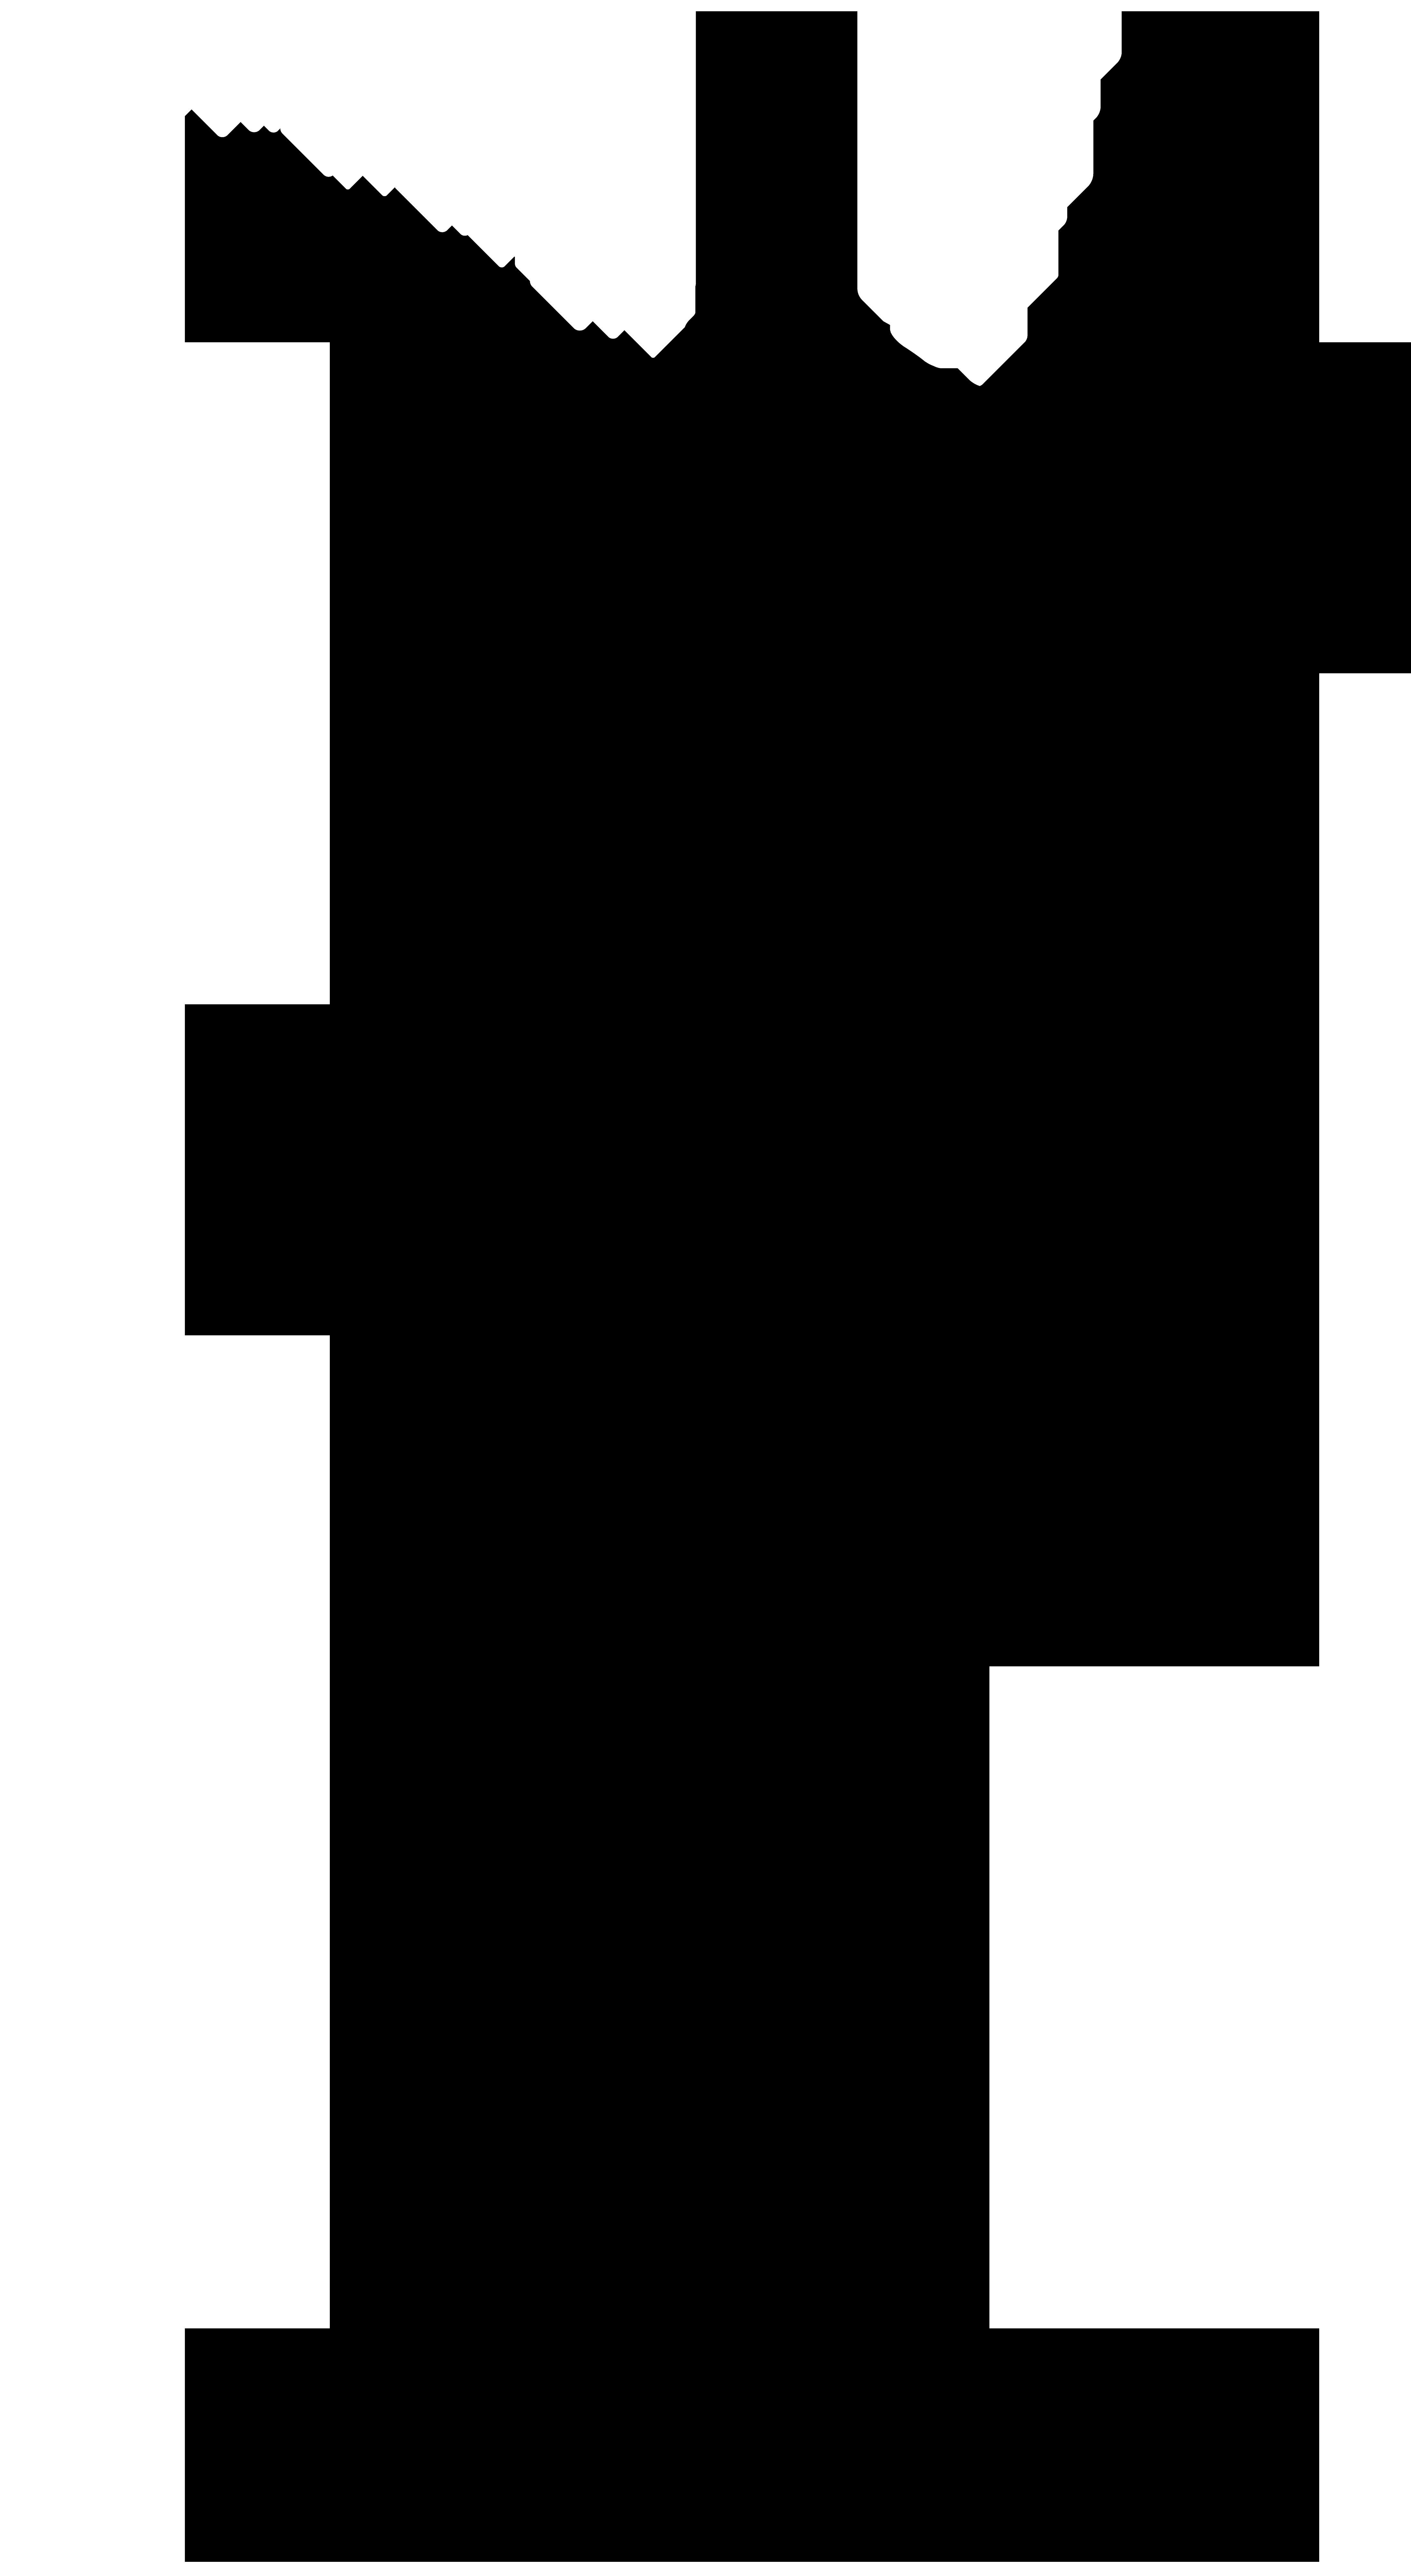 Diver Silhouette PNG Clip Art Image.